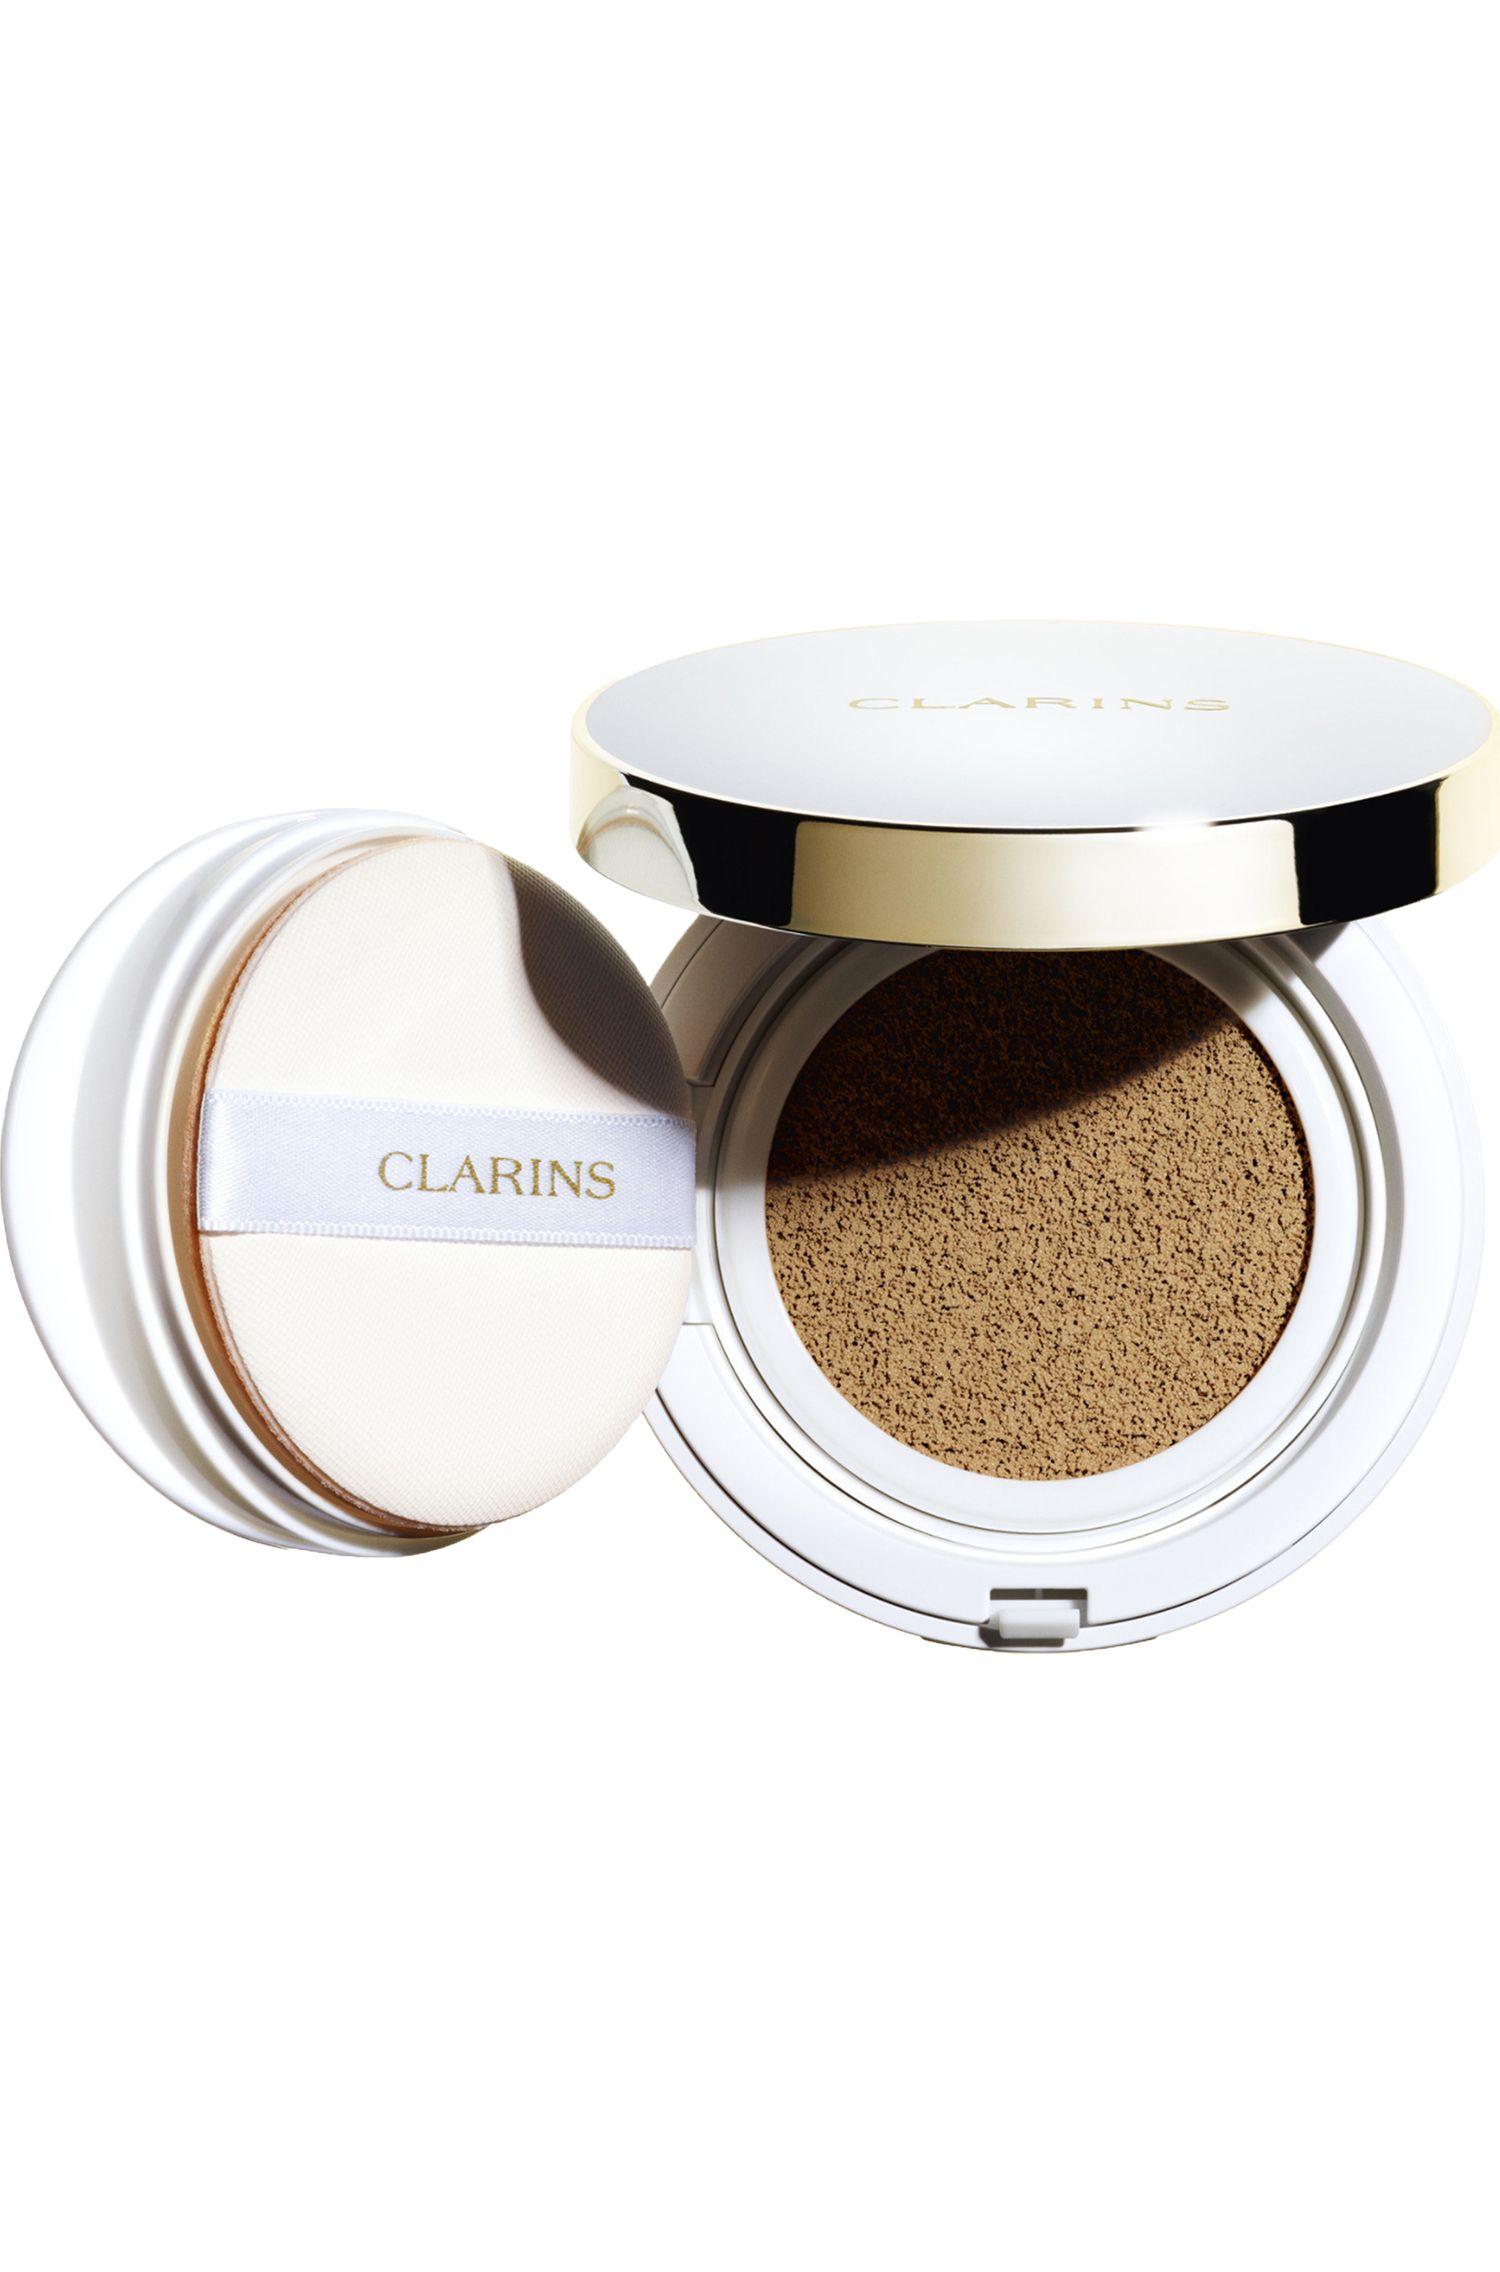 Blissim : Clarins - Fond de teint Cushion longue tenue SPF50 - 110 Honey